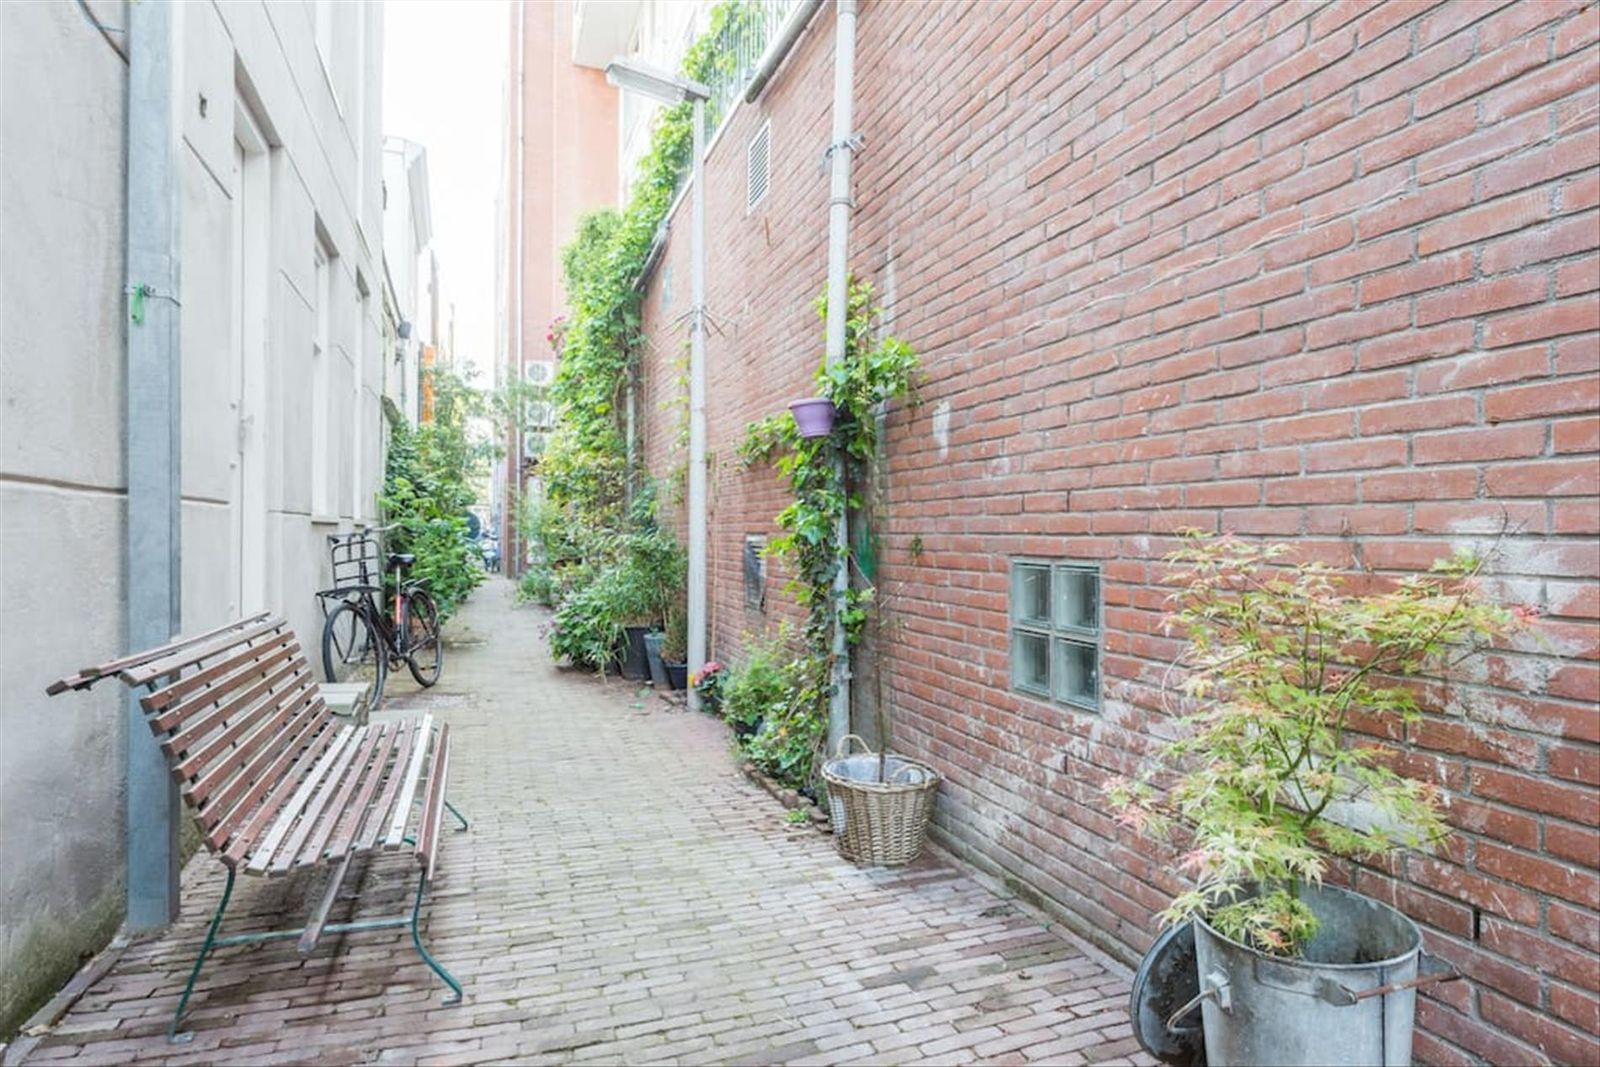 Sint Geertruidensteeg, Amsterdam